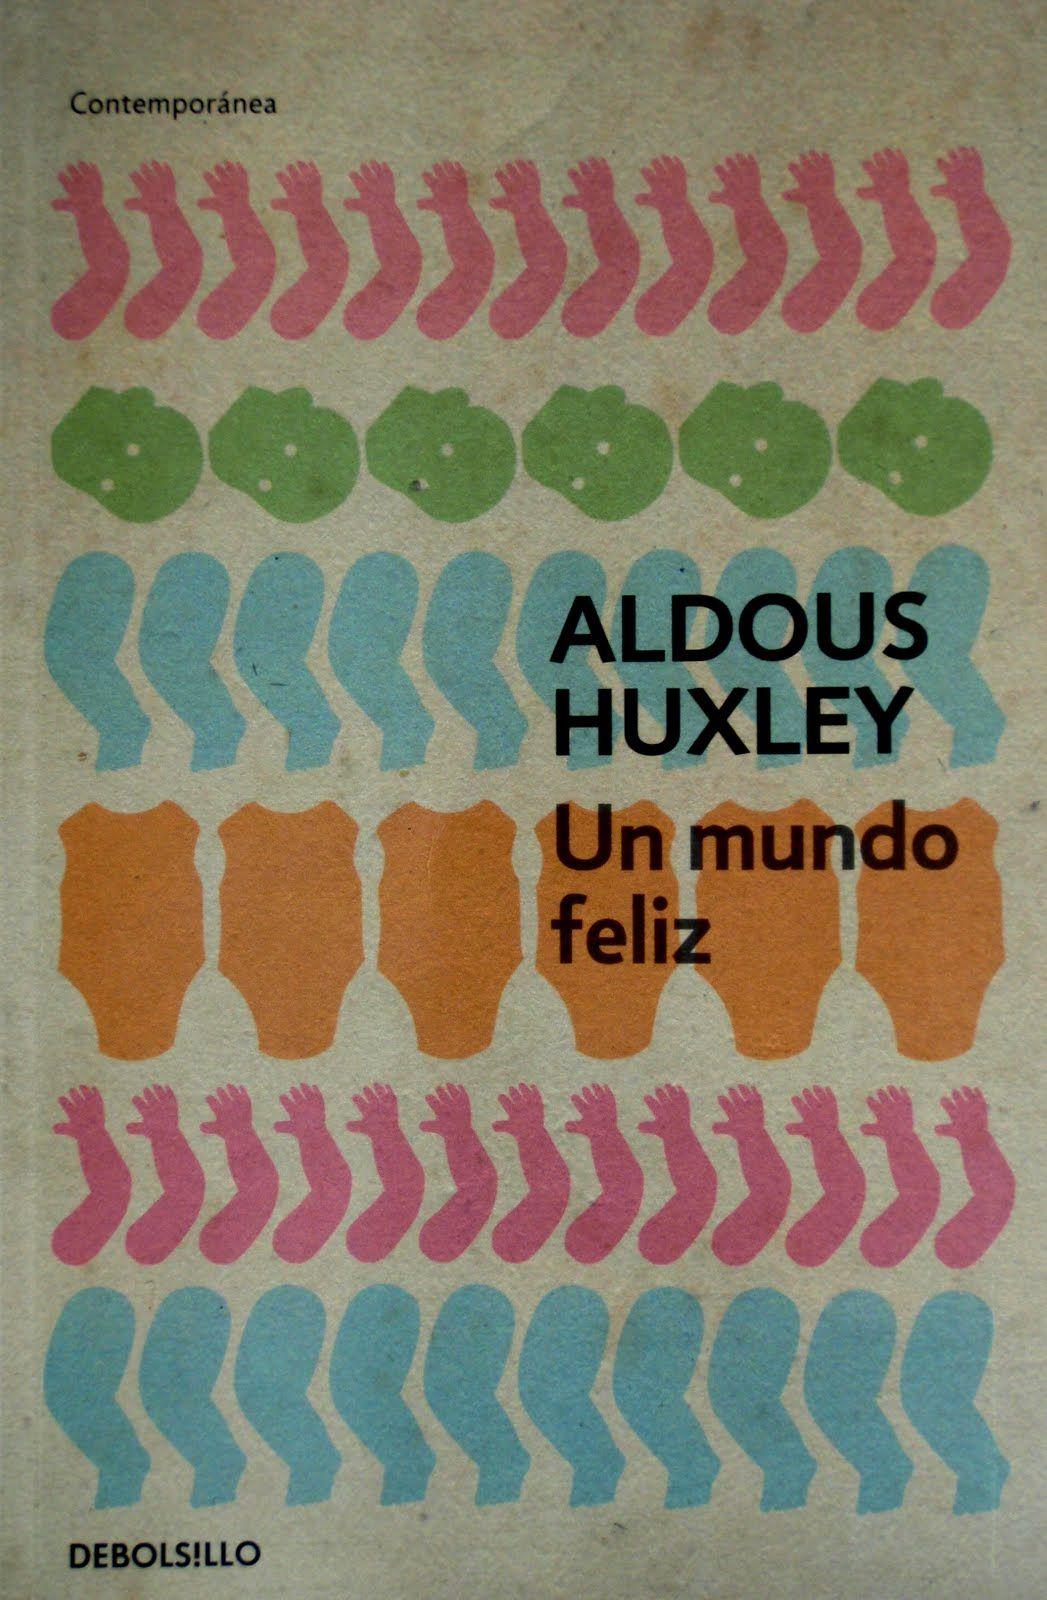 Un mundo feliz, Aldous Huxley | Aldous huxley, Brave new world ...